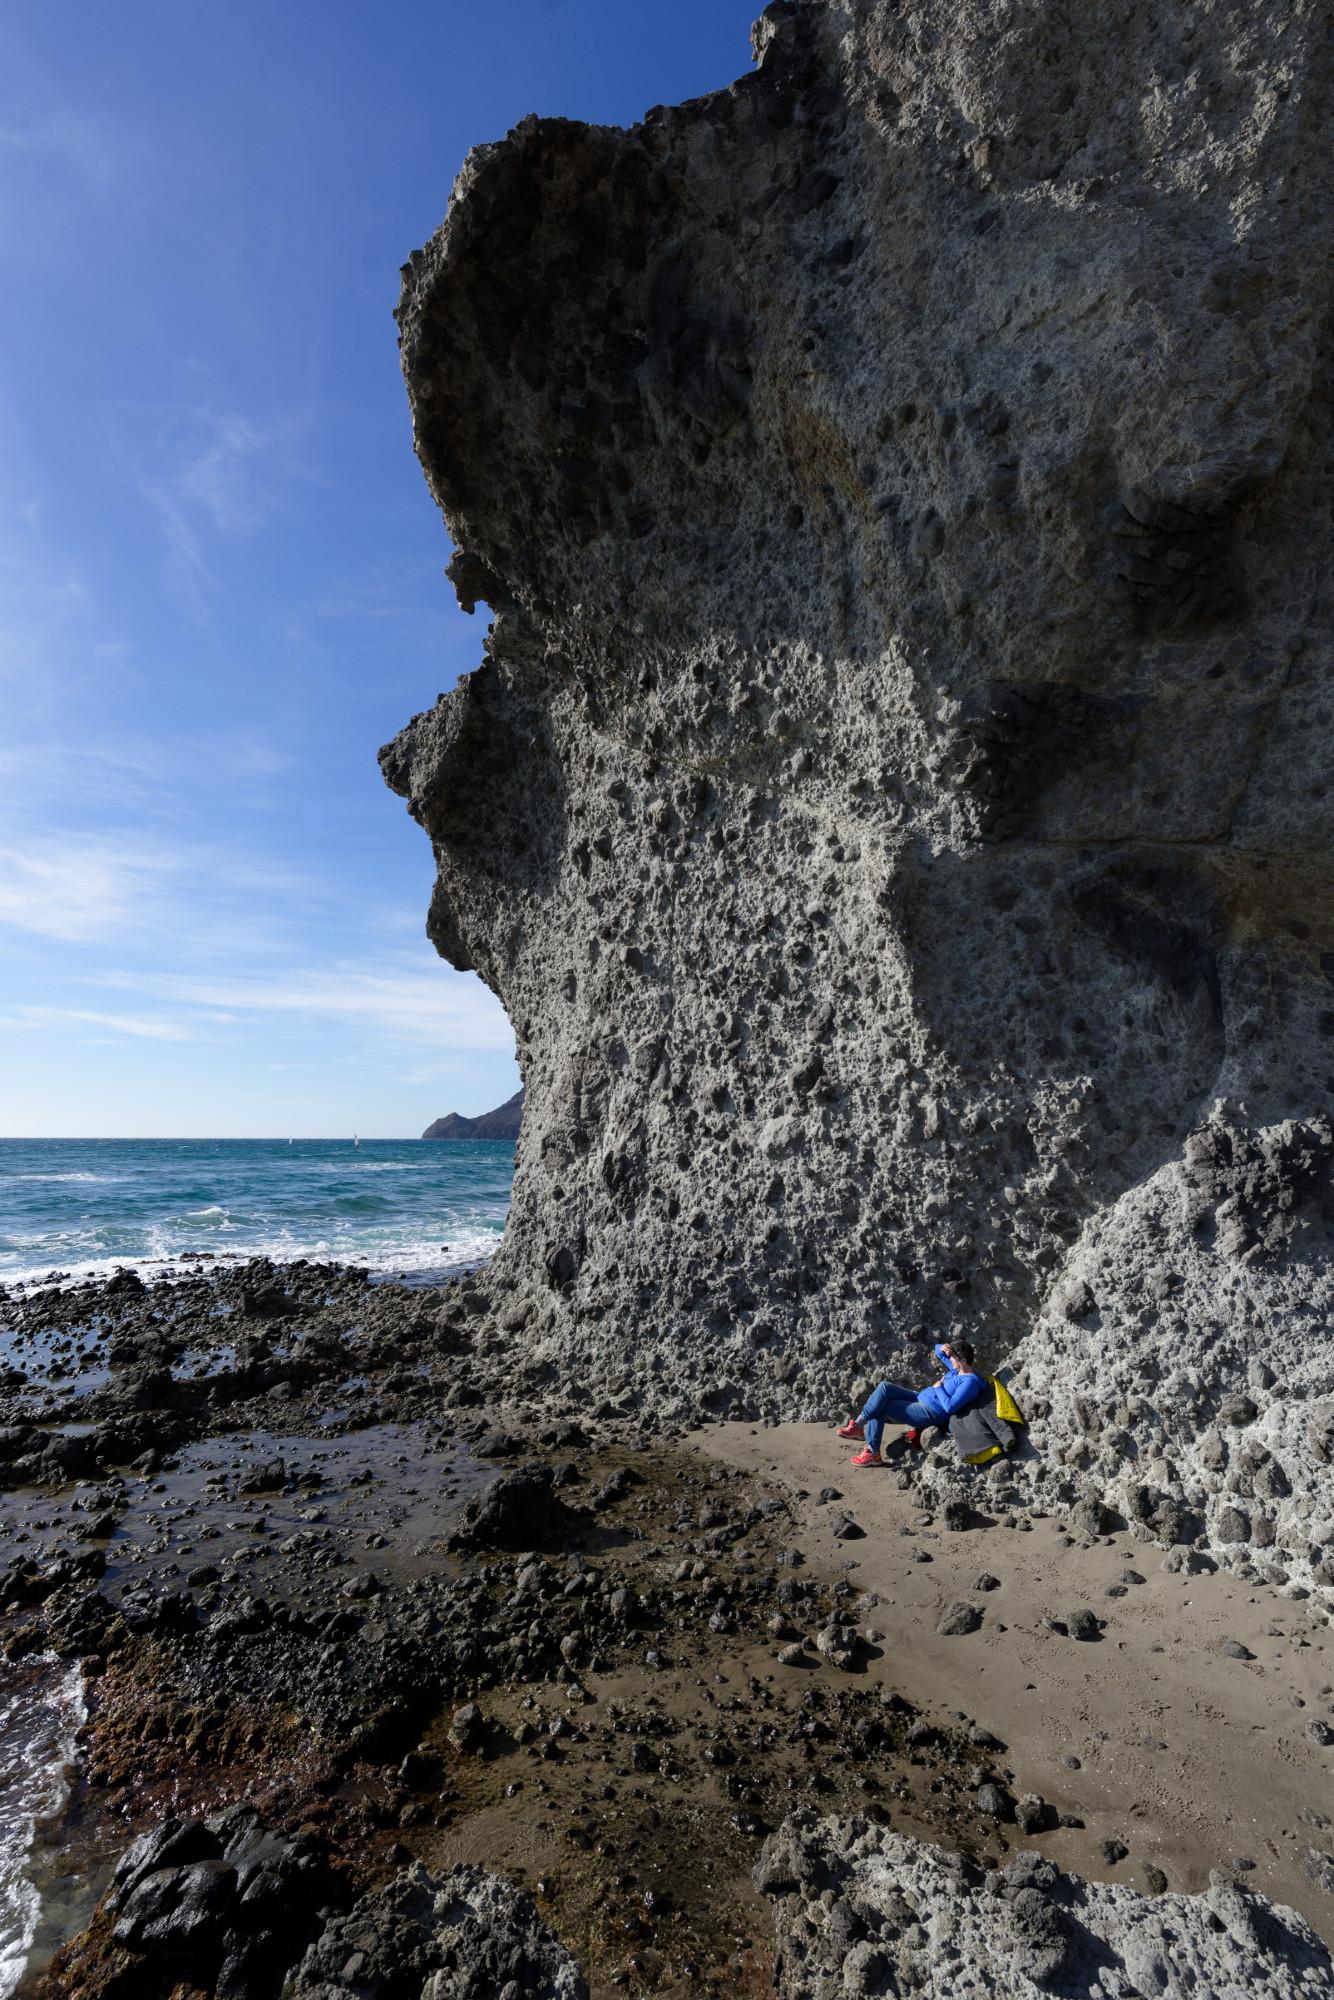 171214-San Jose-Playa del Monsul (Cabo de Gata-Andalousie) (179)